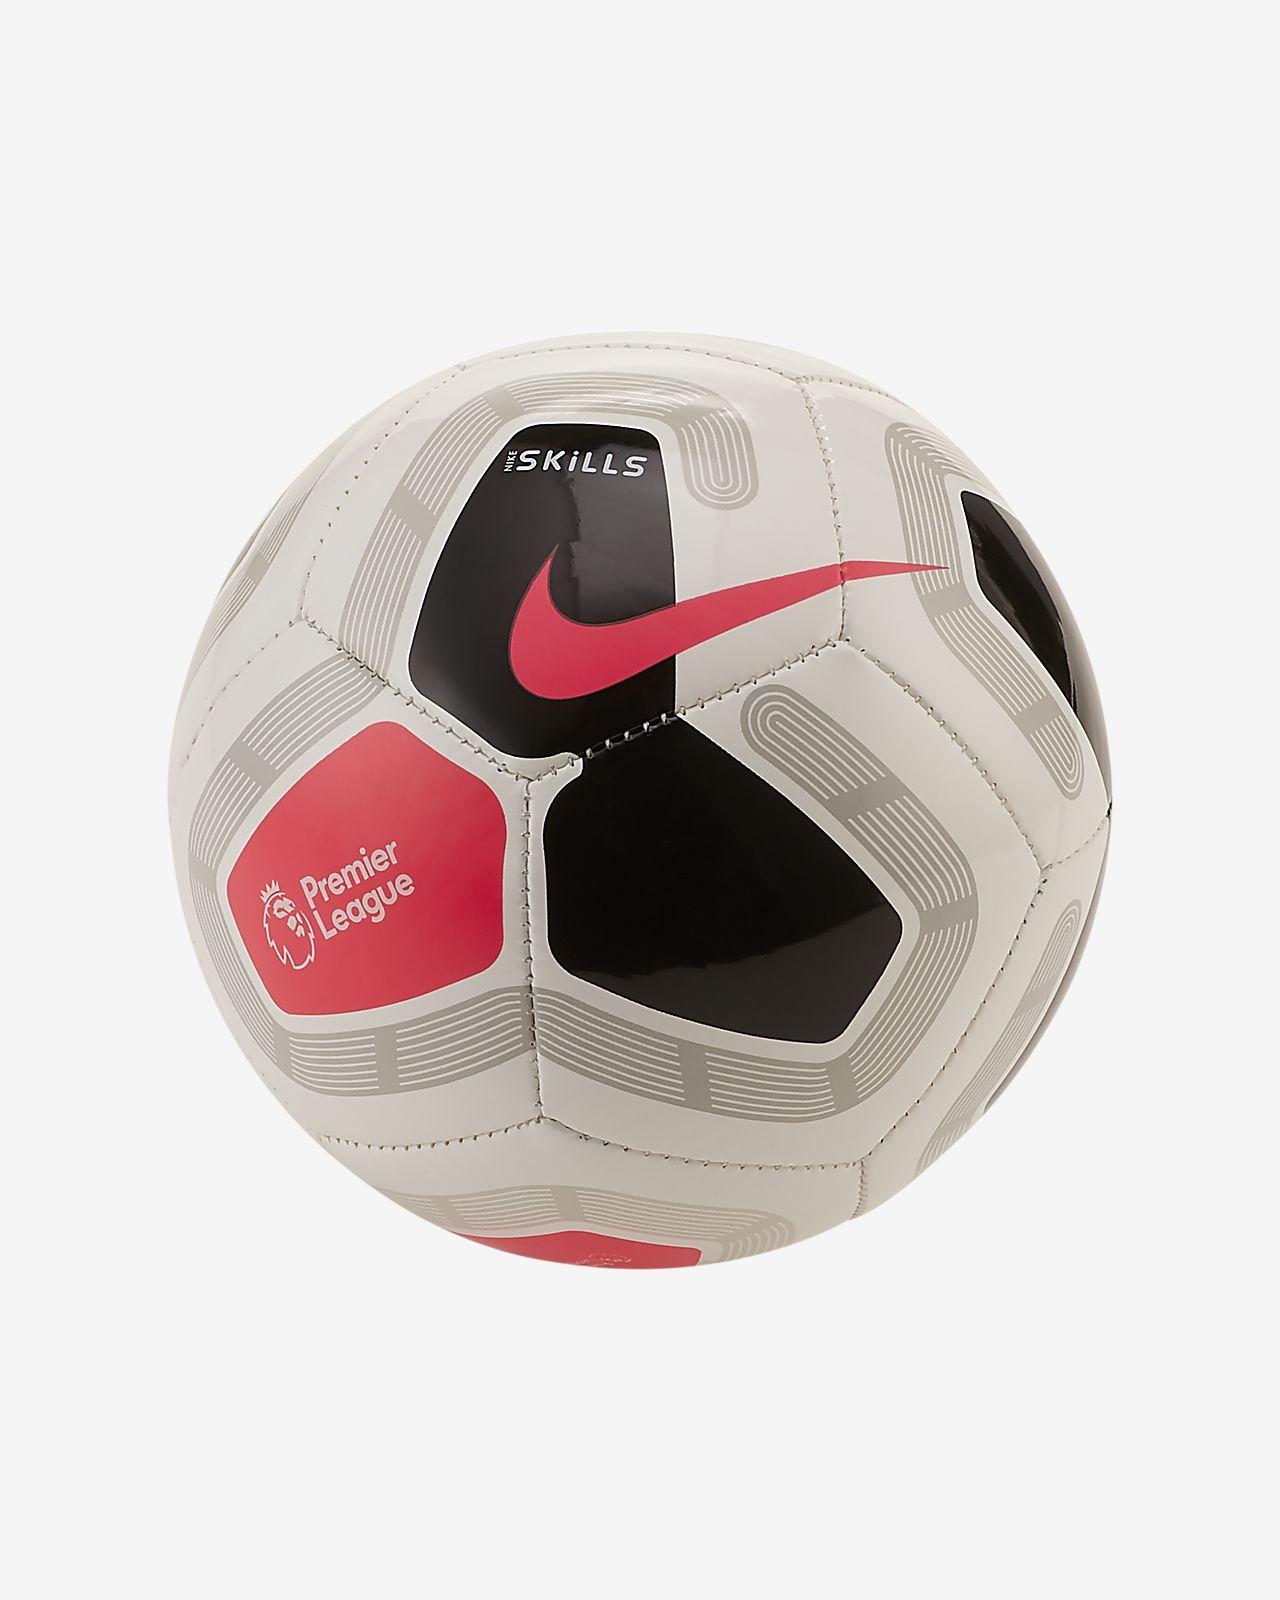 English Premier League Skills Football